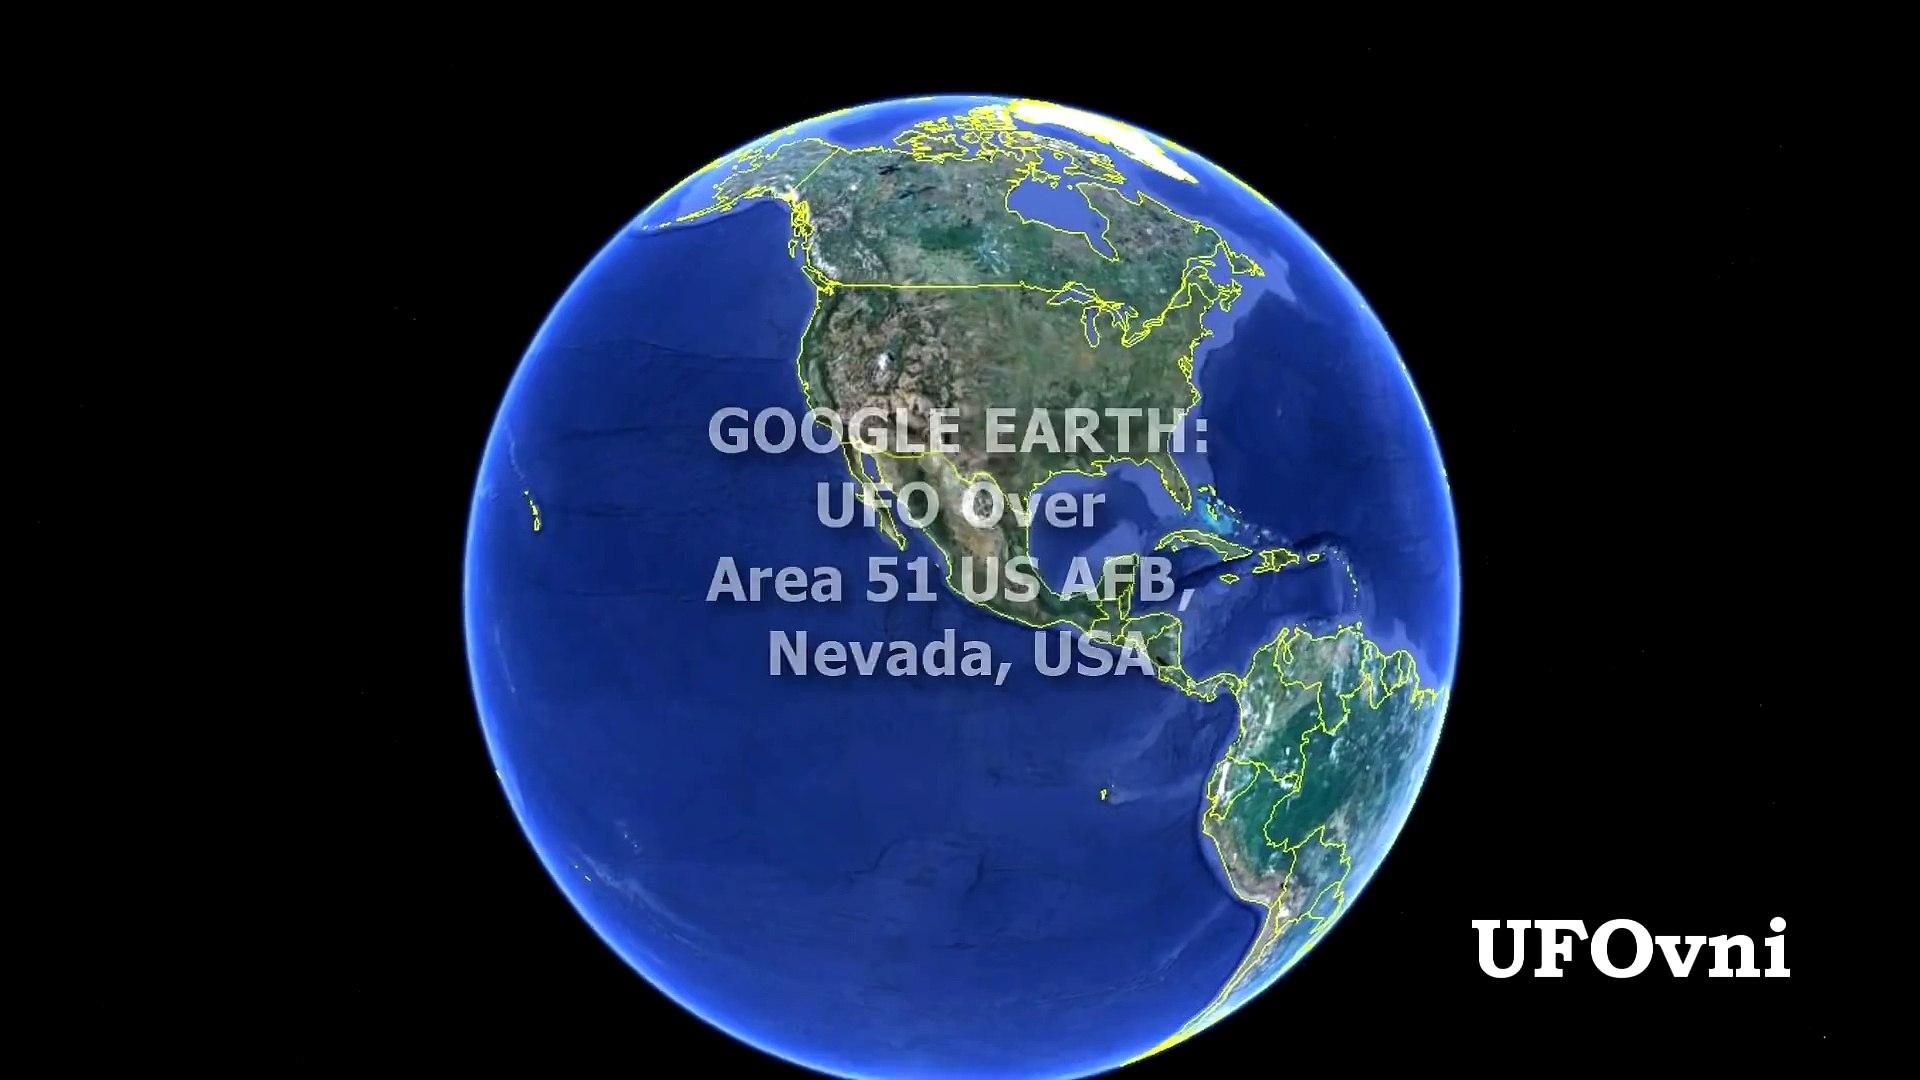 Amazing! UFO Discovered Near Area 51 & Area S4 On Google Earth Map! April 2013